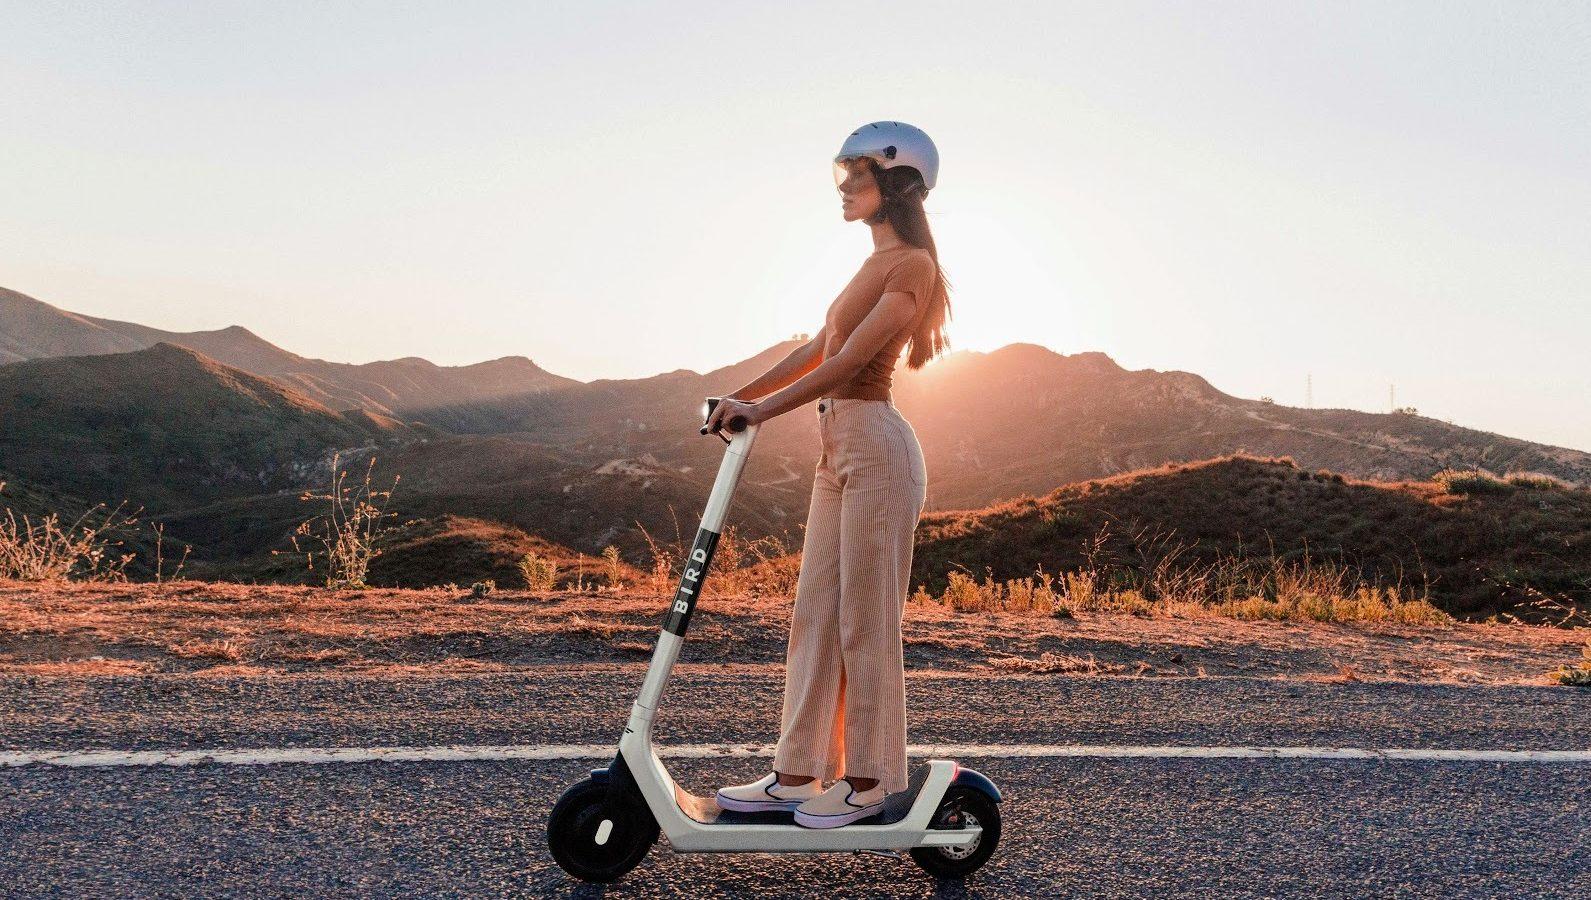 Woman riding Bird scooter